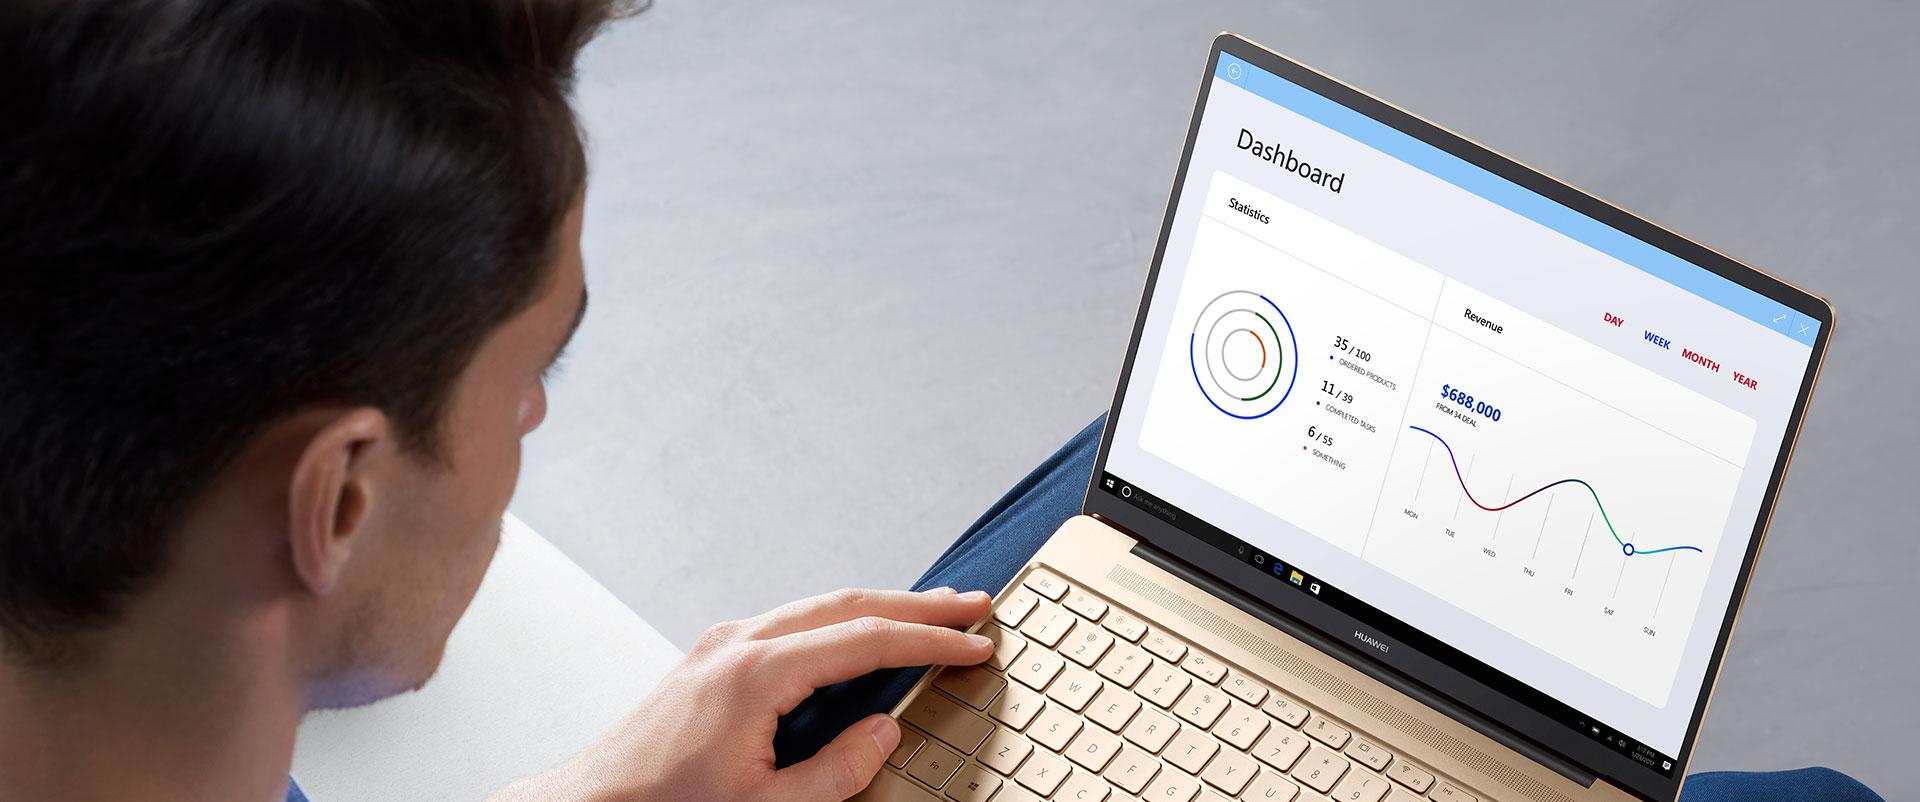 Huawei MateBook X hero